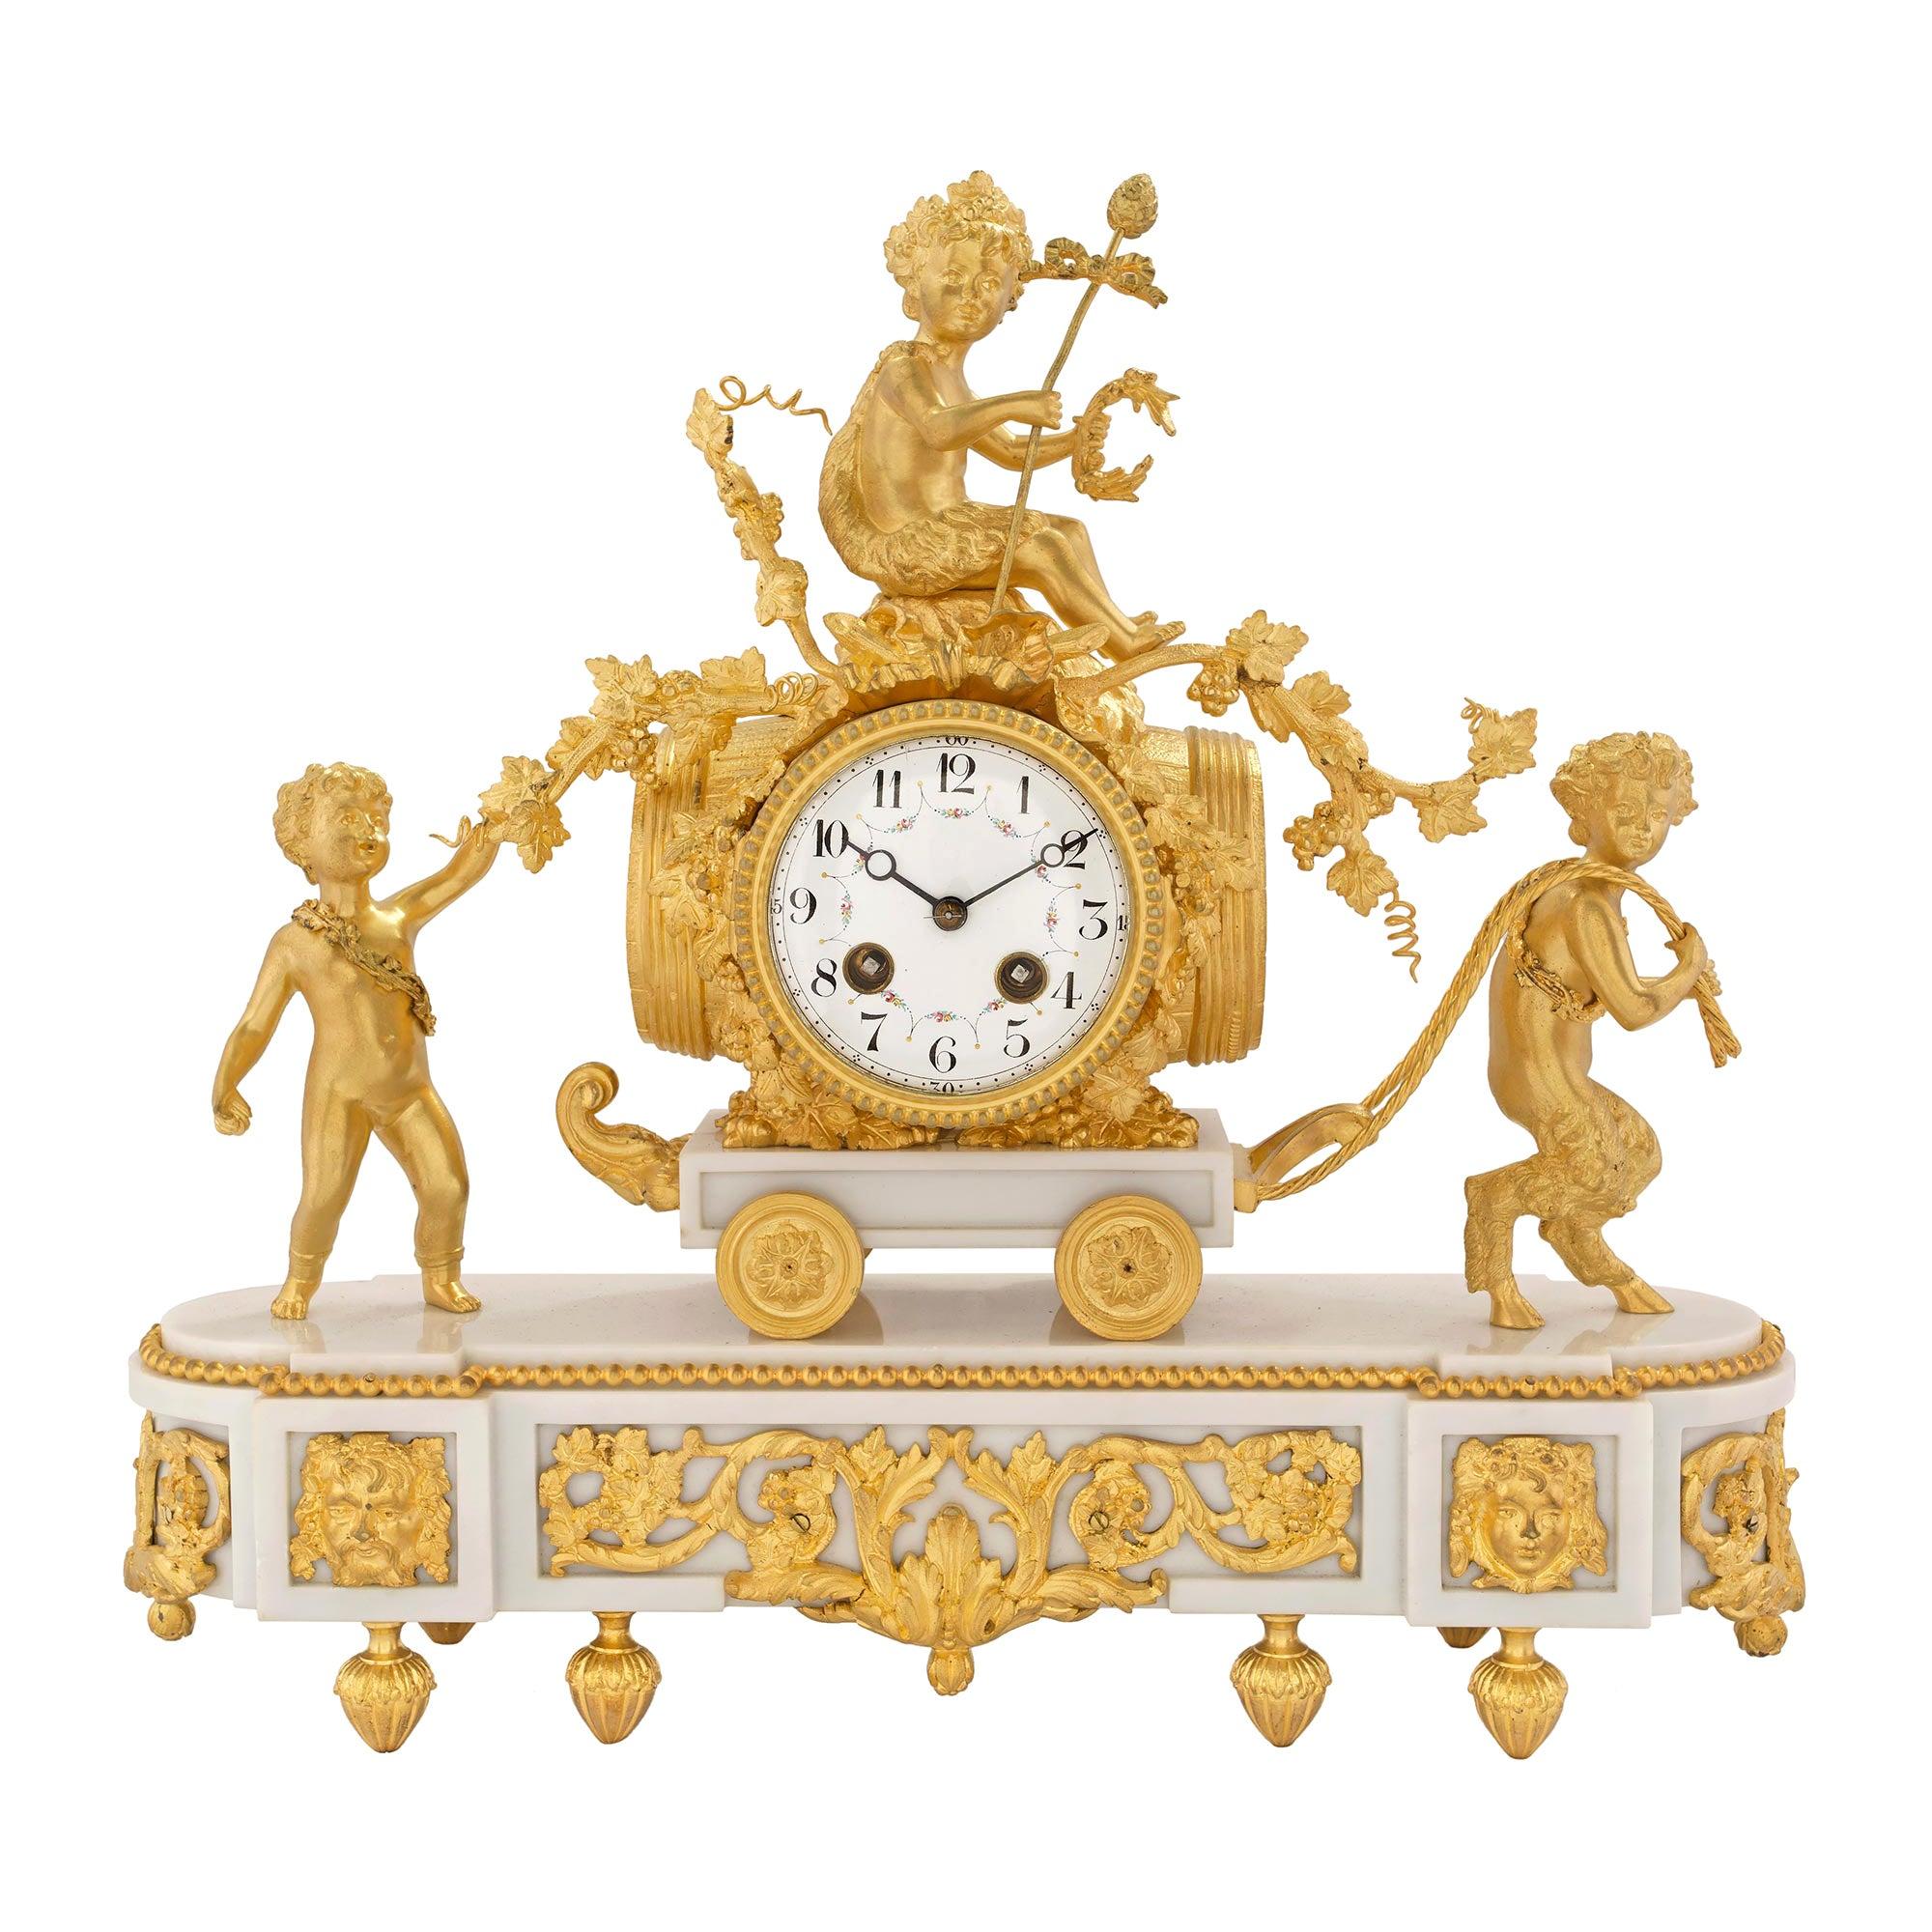 French 19th Century Louis XVI Style White Carrara Marble and Ormolu Clock